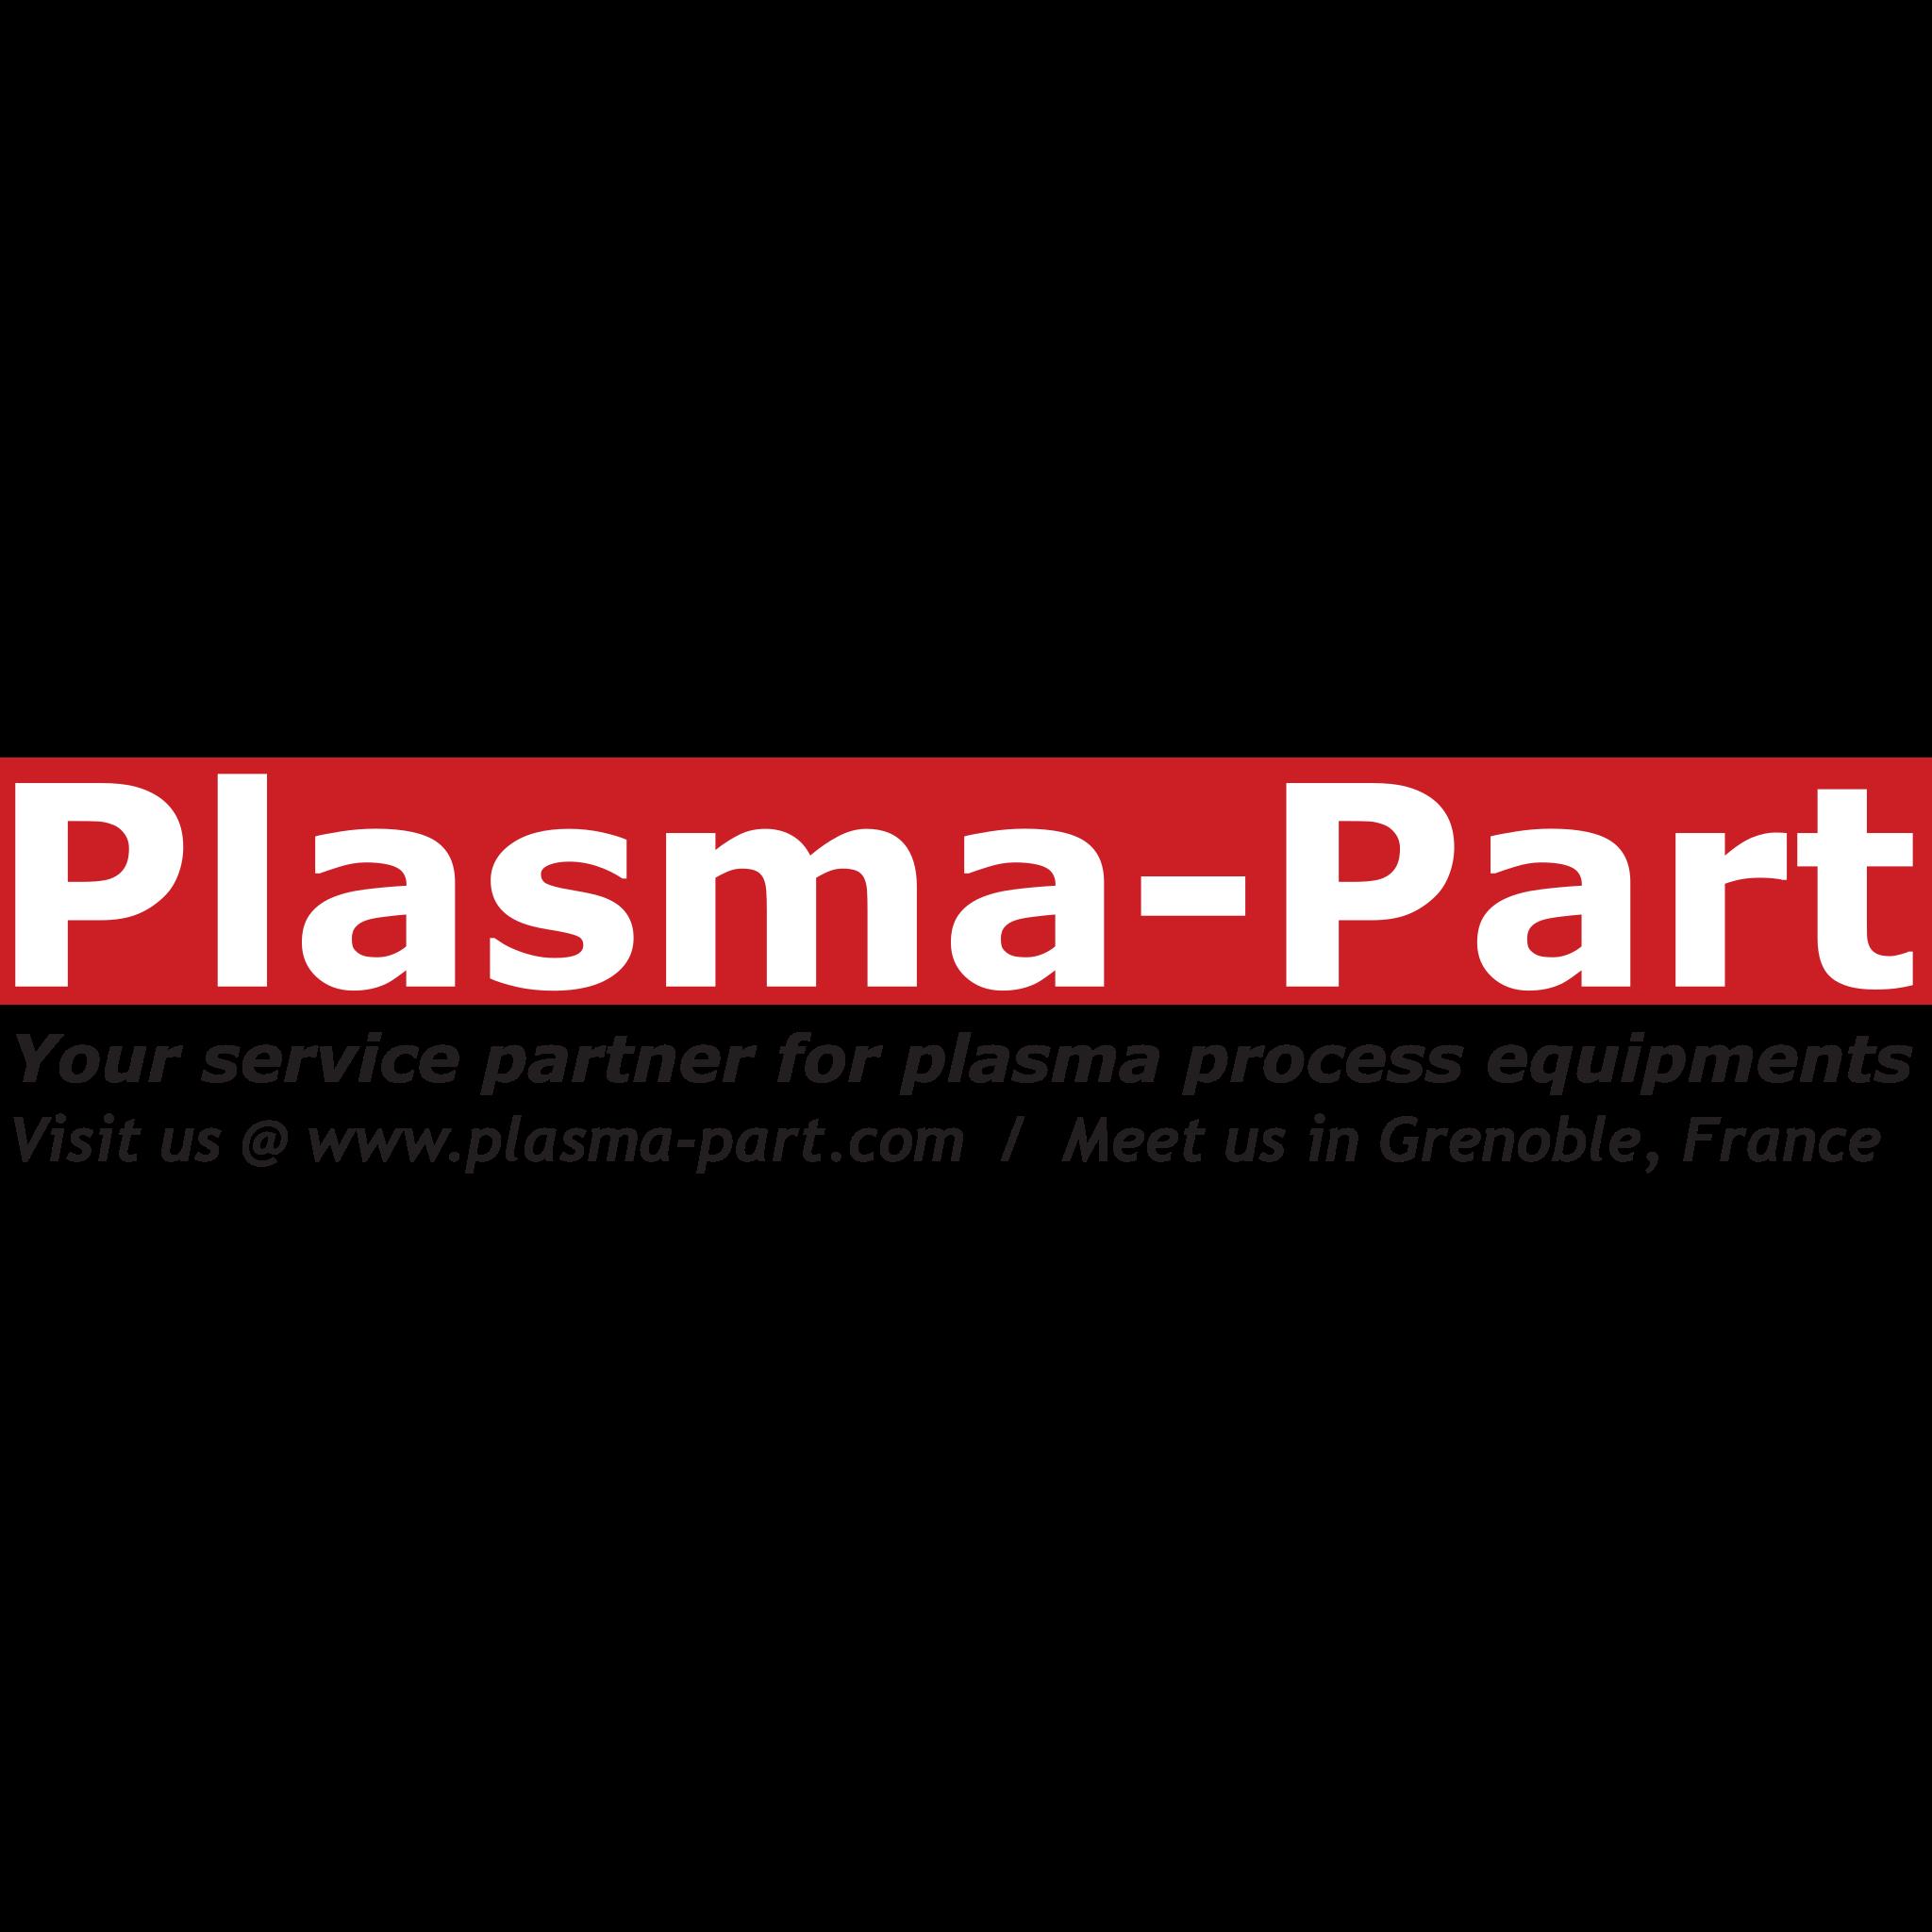 PlasmaPart